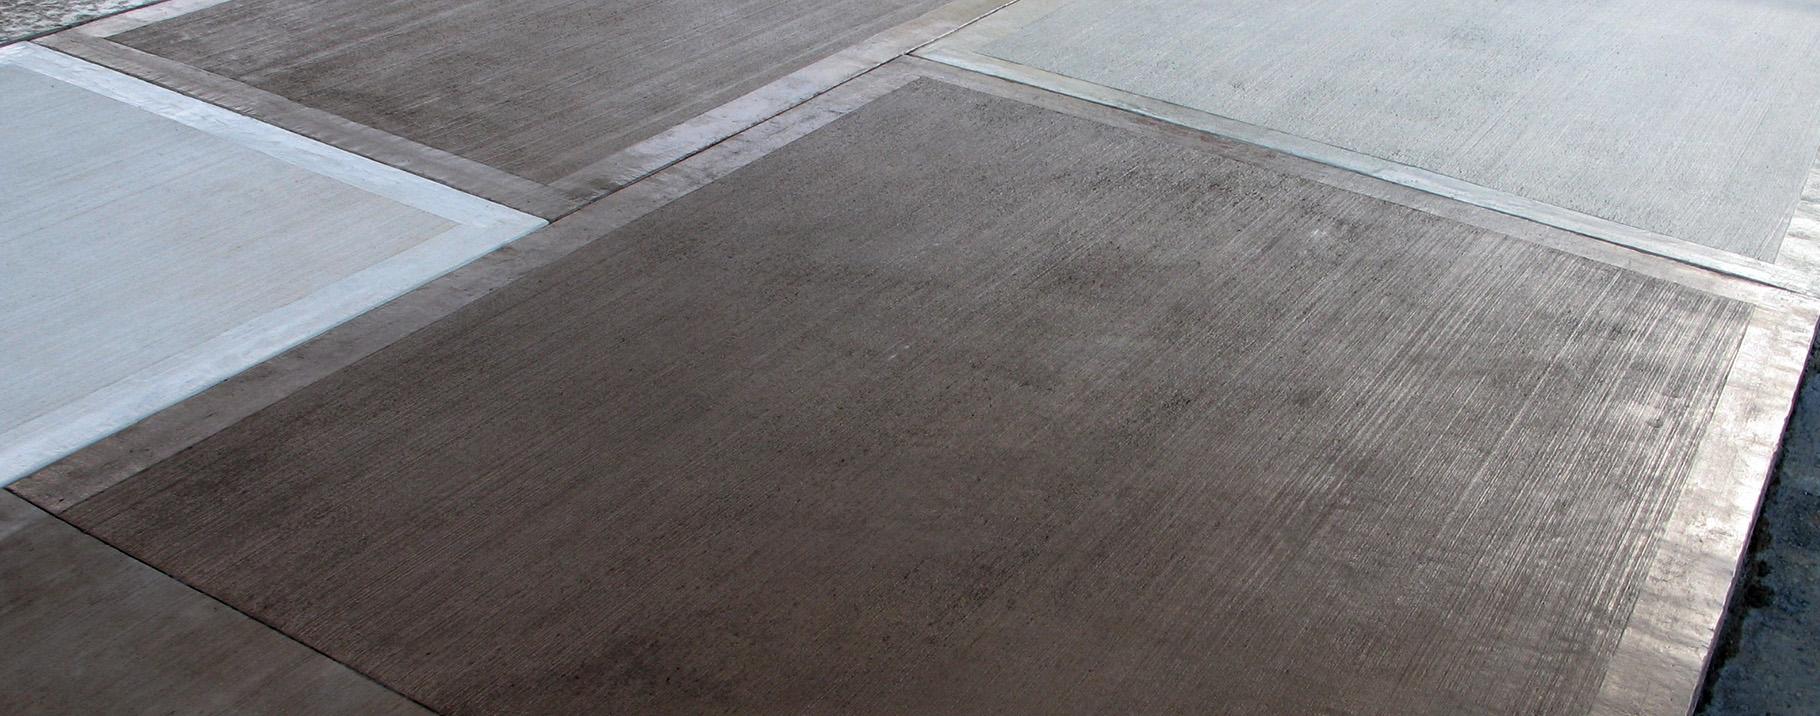 -Non-slip concrete floor